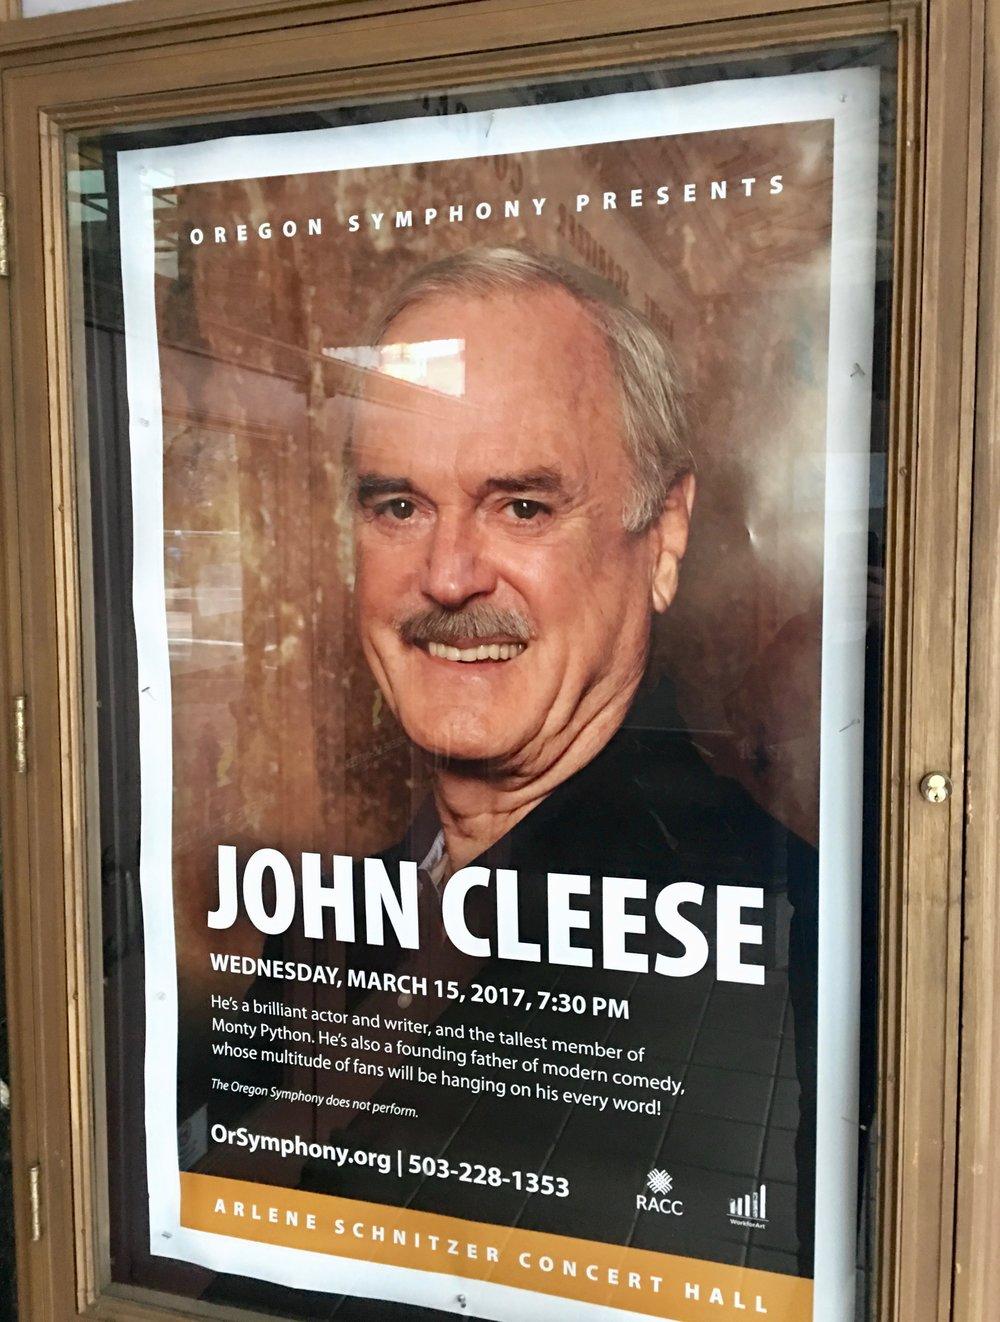 John Cleese At The Arlene Schnitzer Concert Hall Always Packed For - Arlene schnitzer tickets